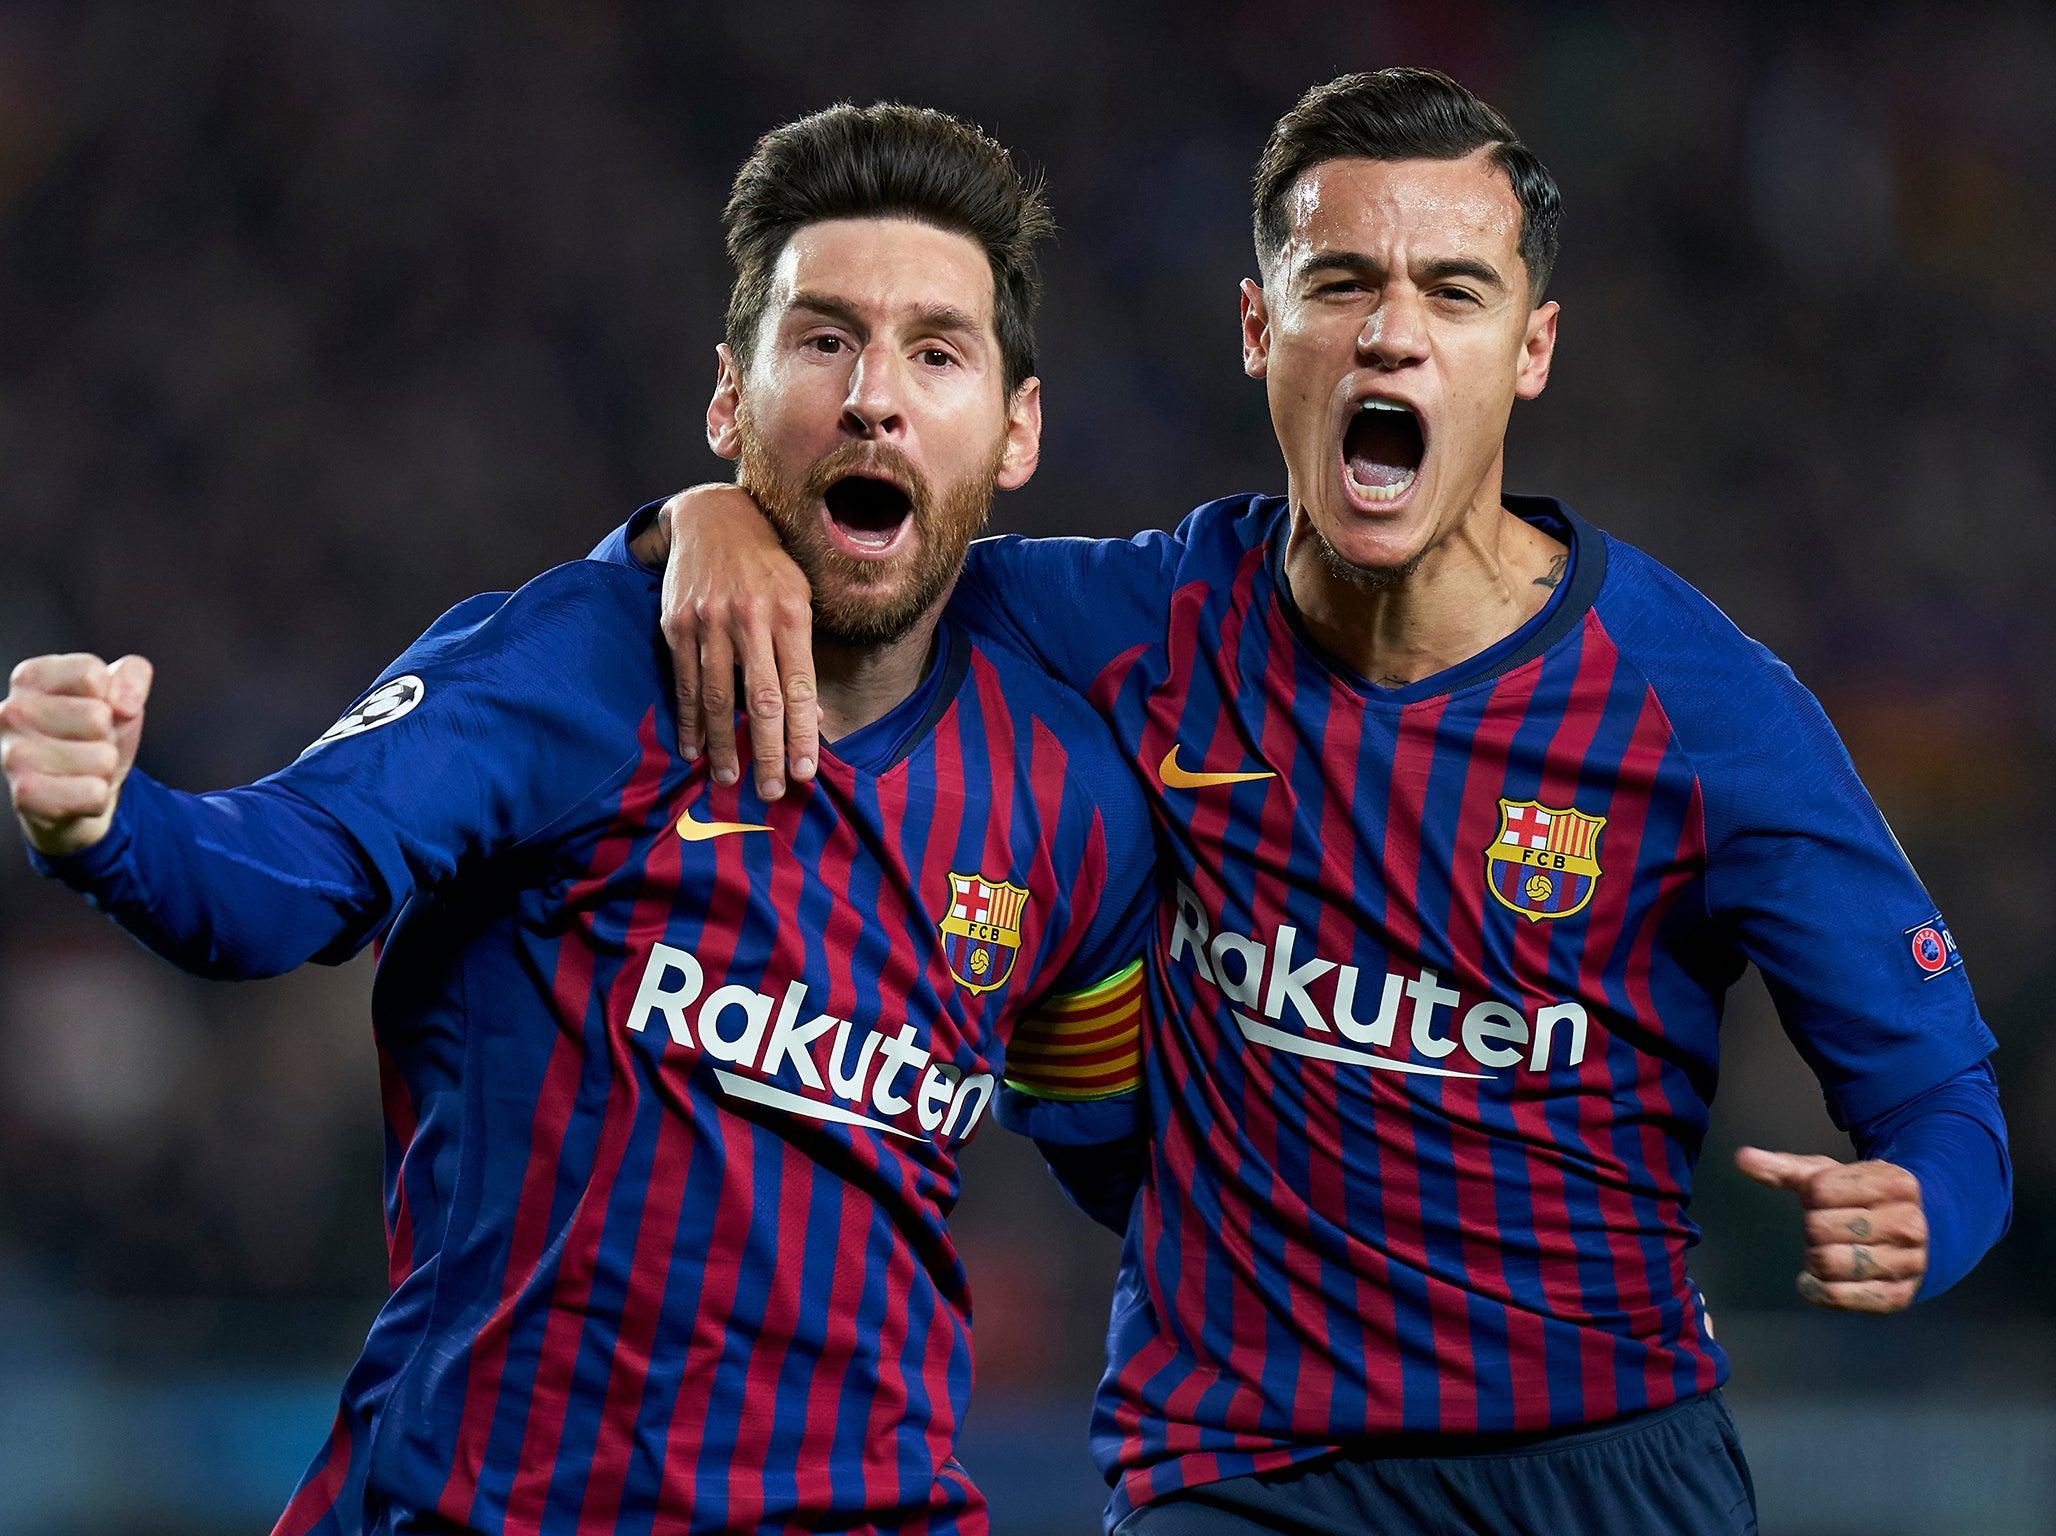 Barcelona vs Manchester United LIVE: Stream, video, TV